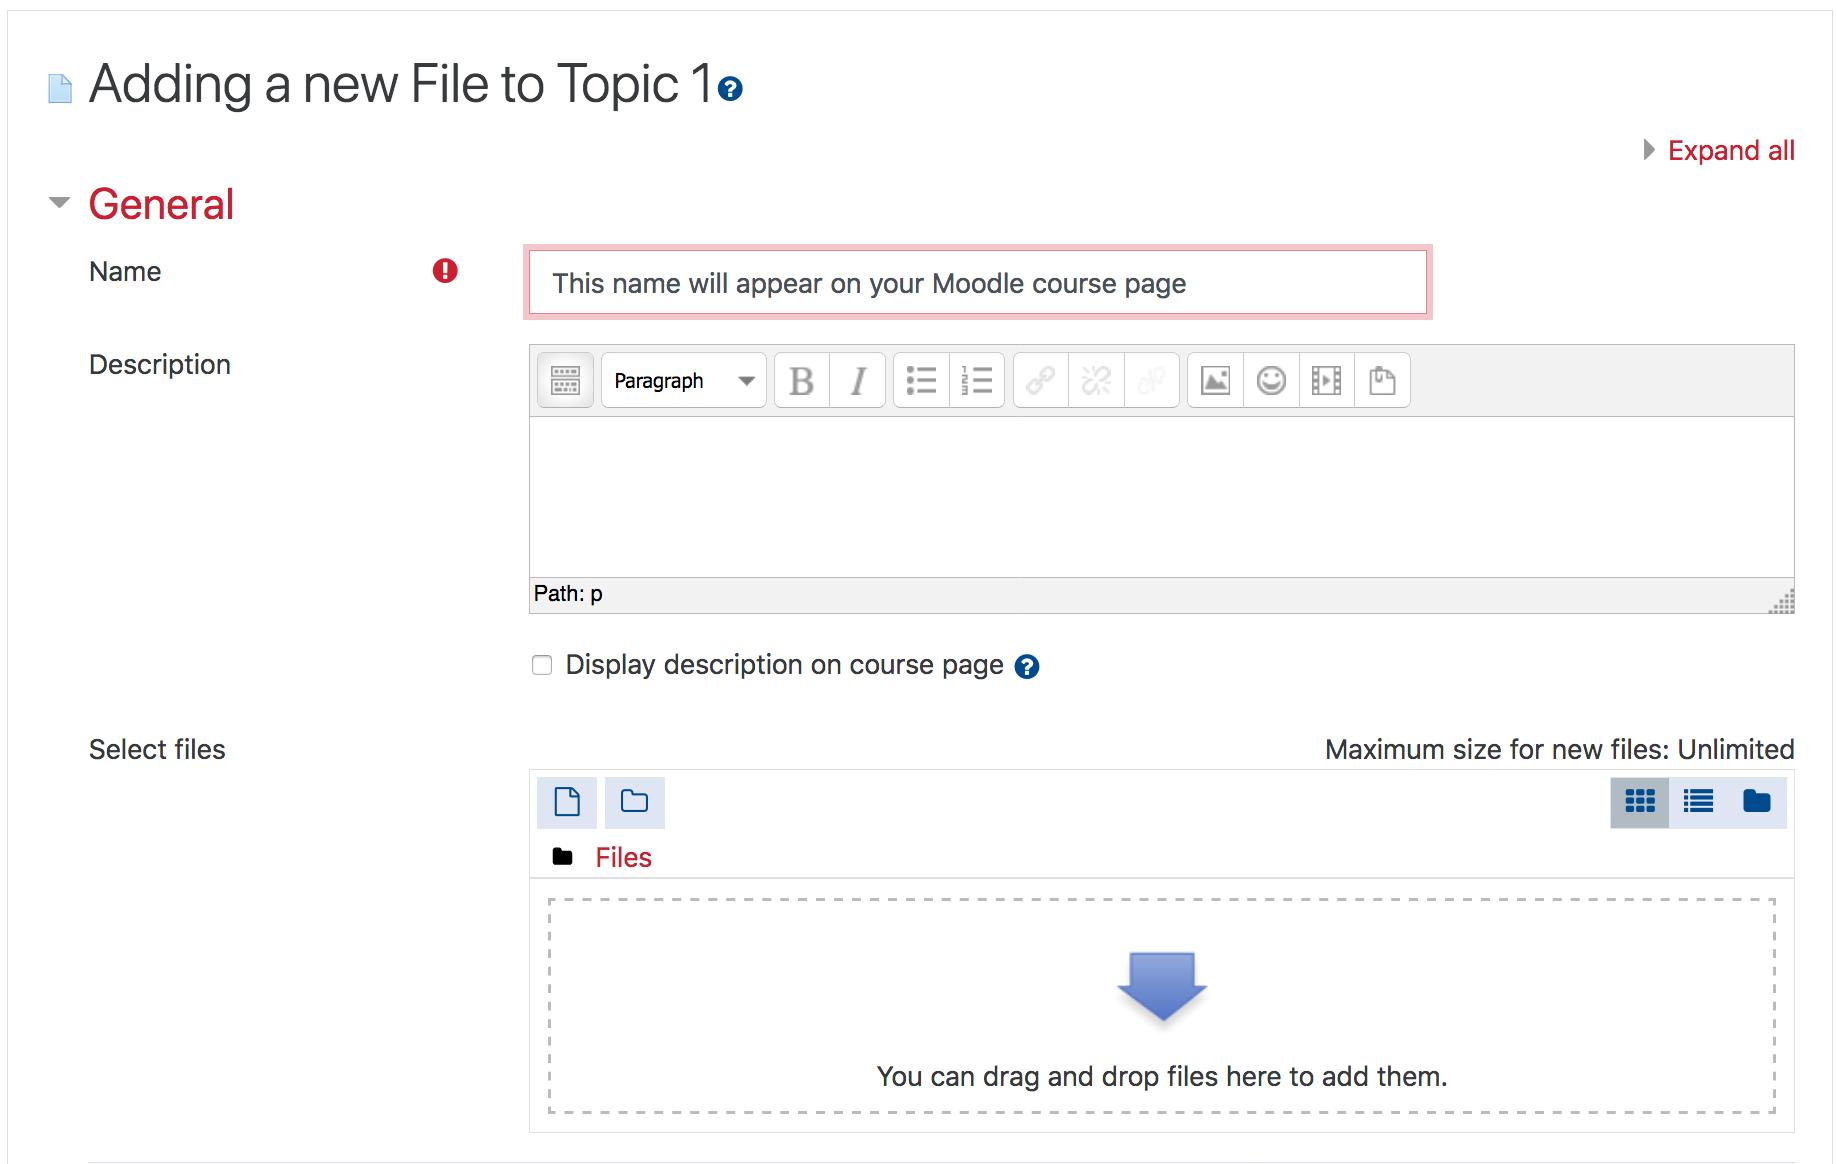 Screenshot of Adding a new file settings